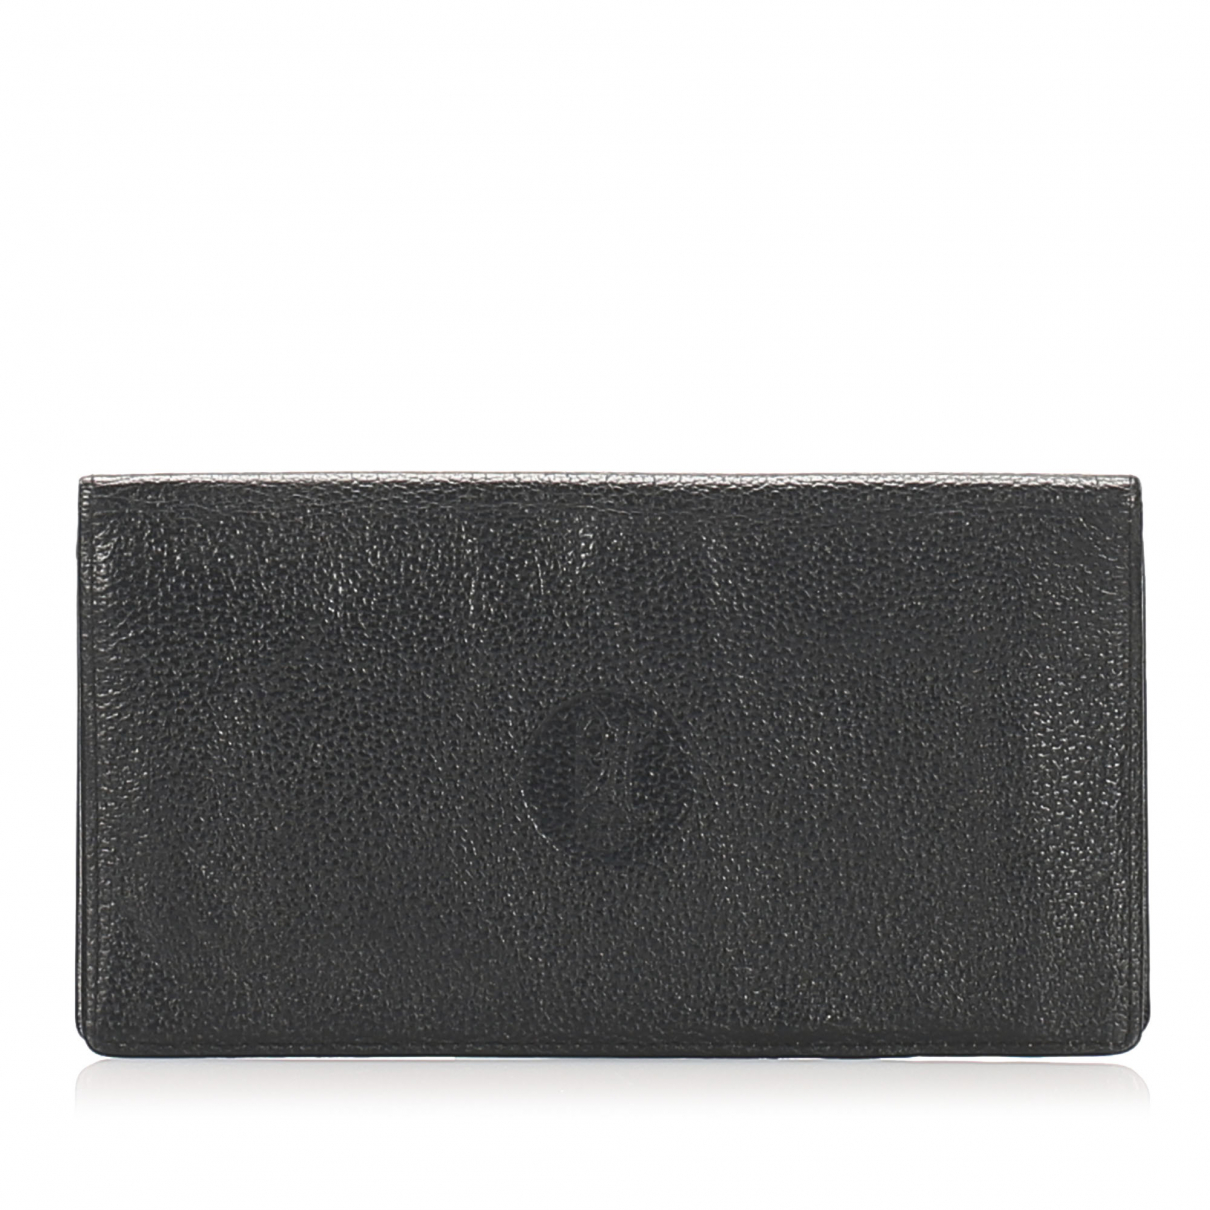 Celine \N Portemonnaie in  Schwarz Leder